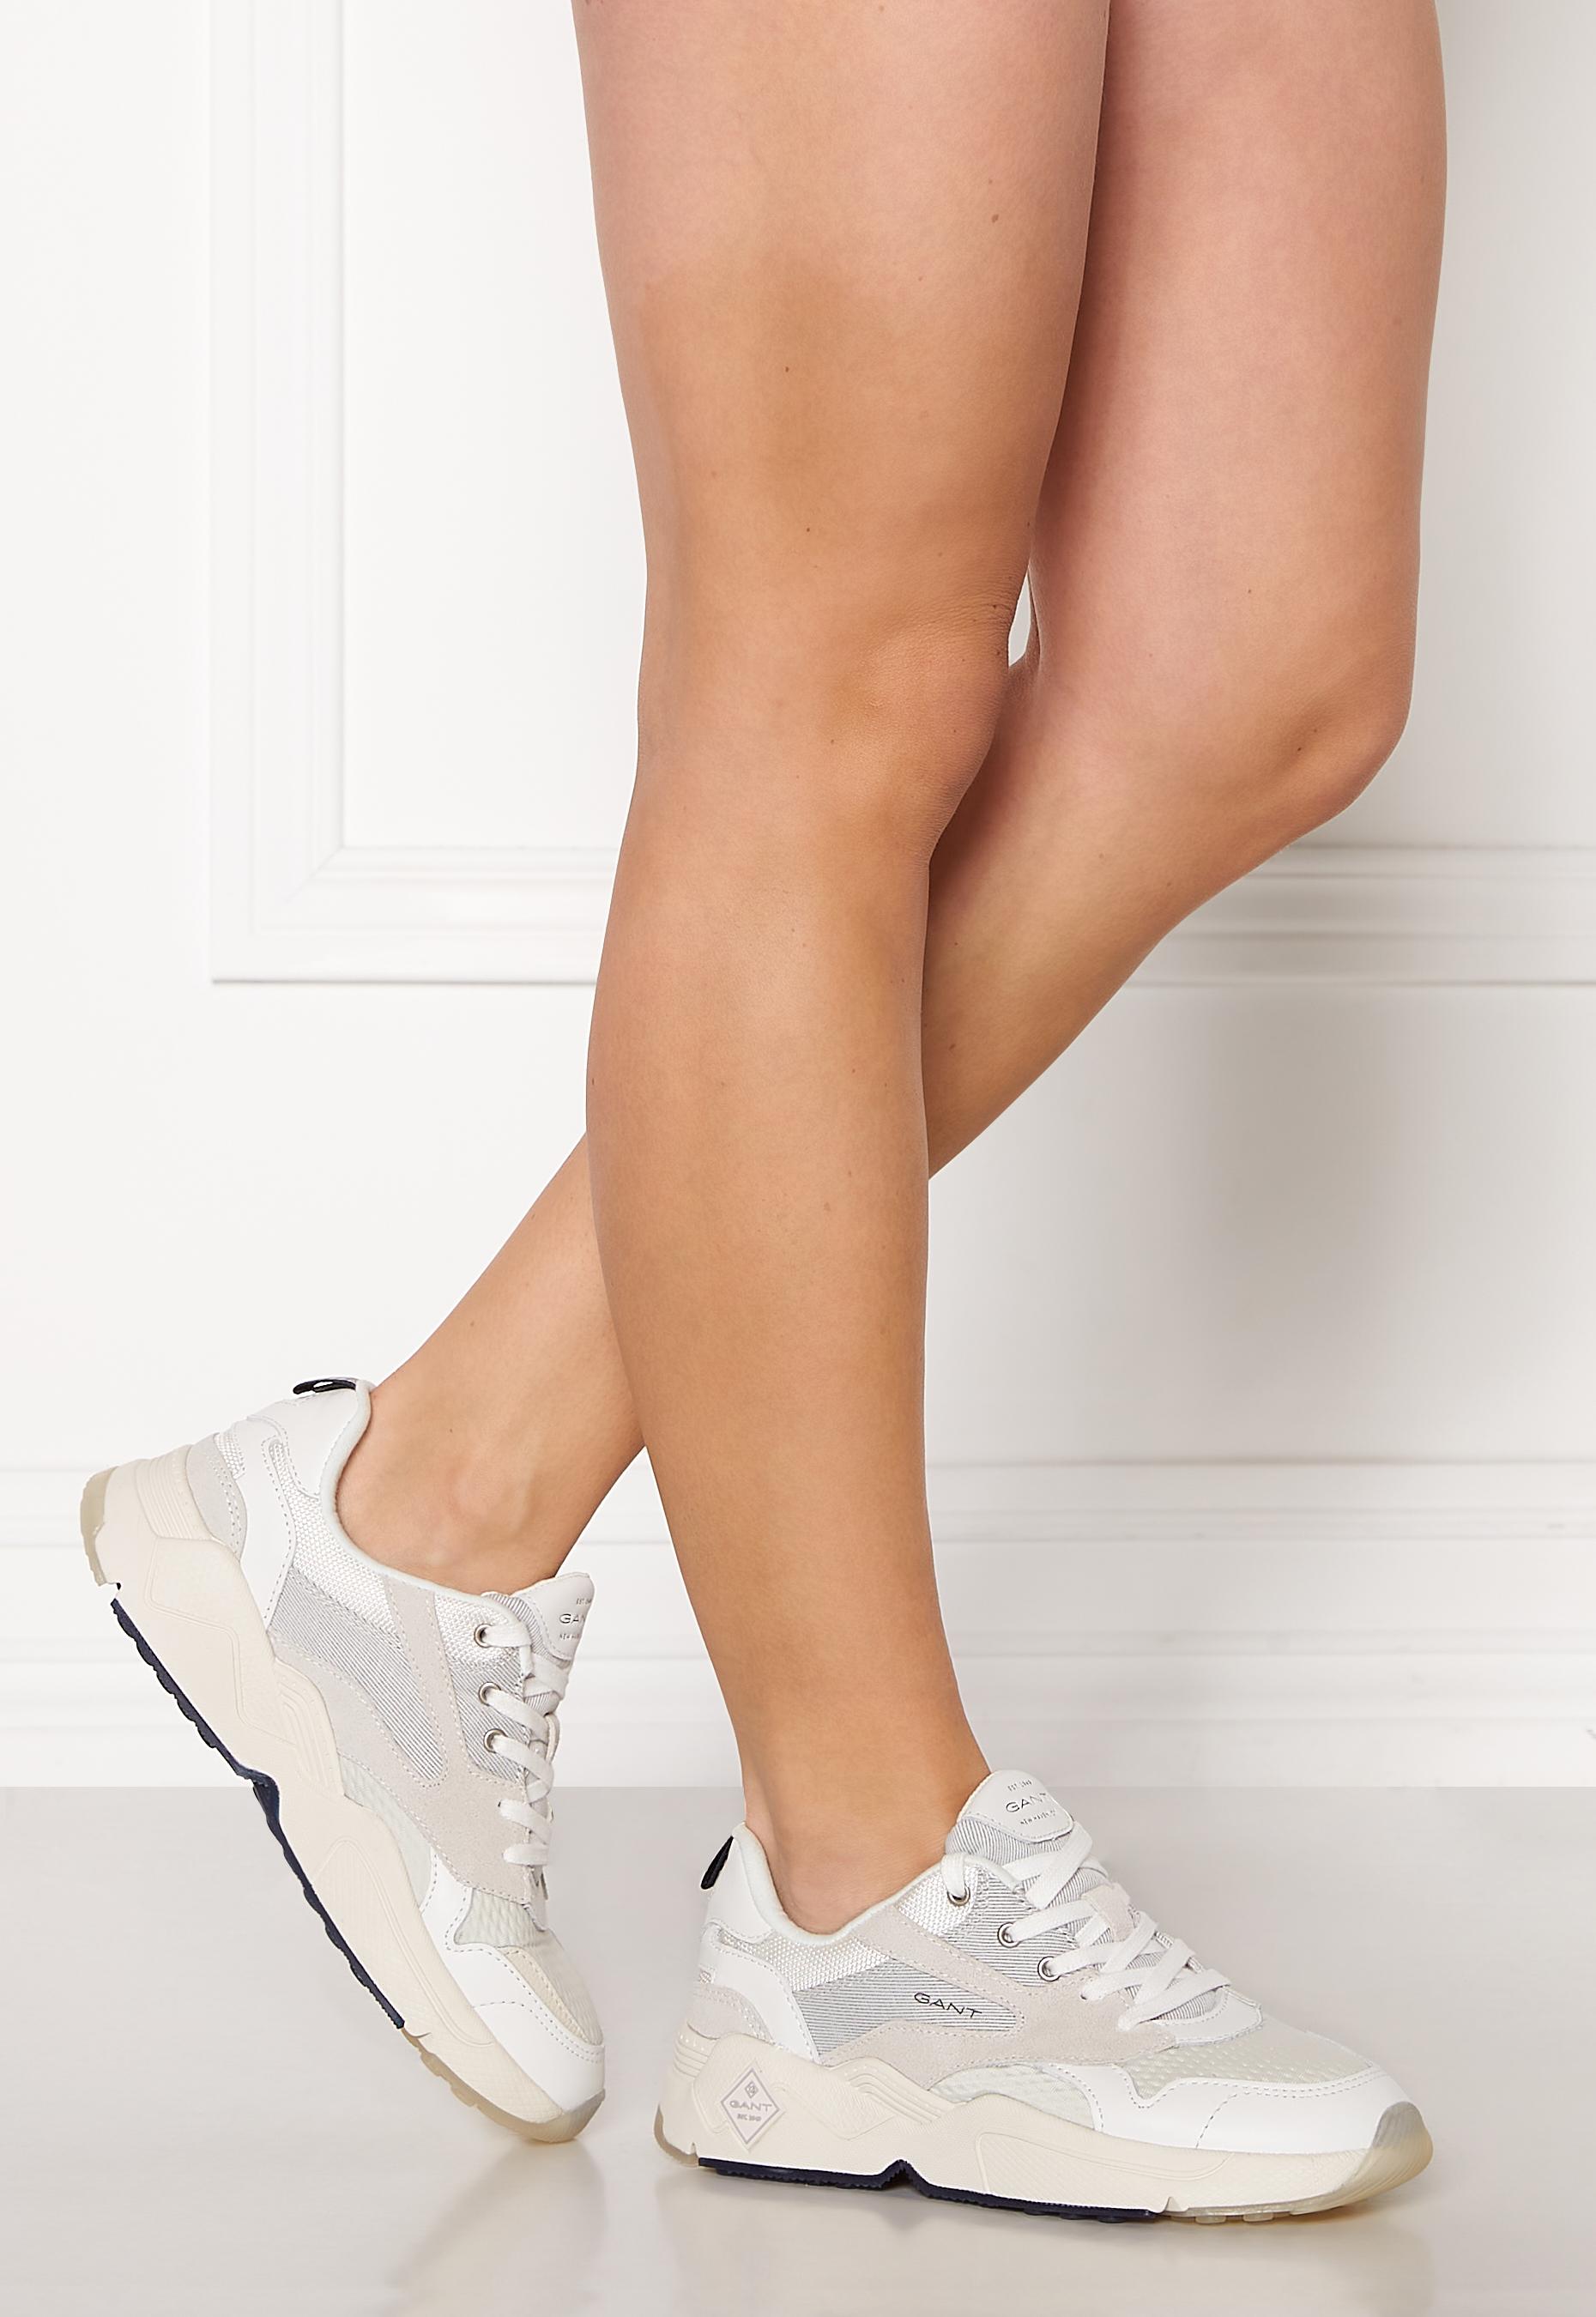 GANT Nicewill Sneaker White - Bubbleroom